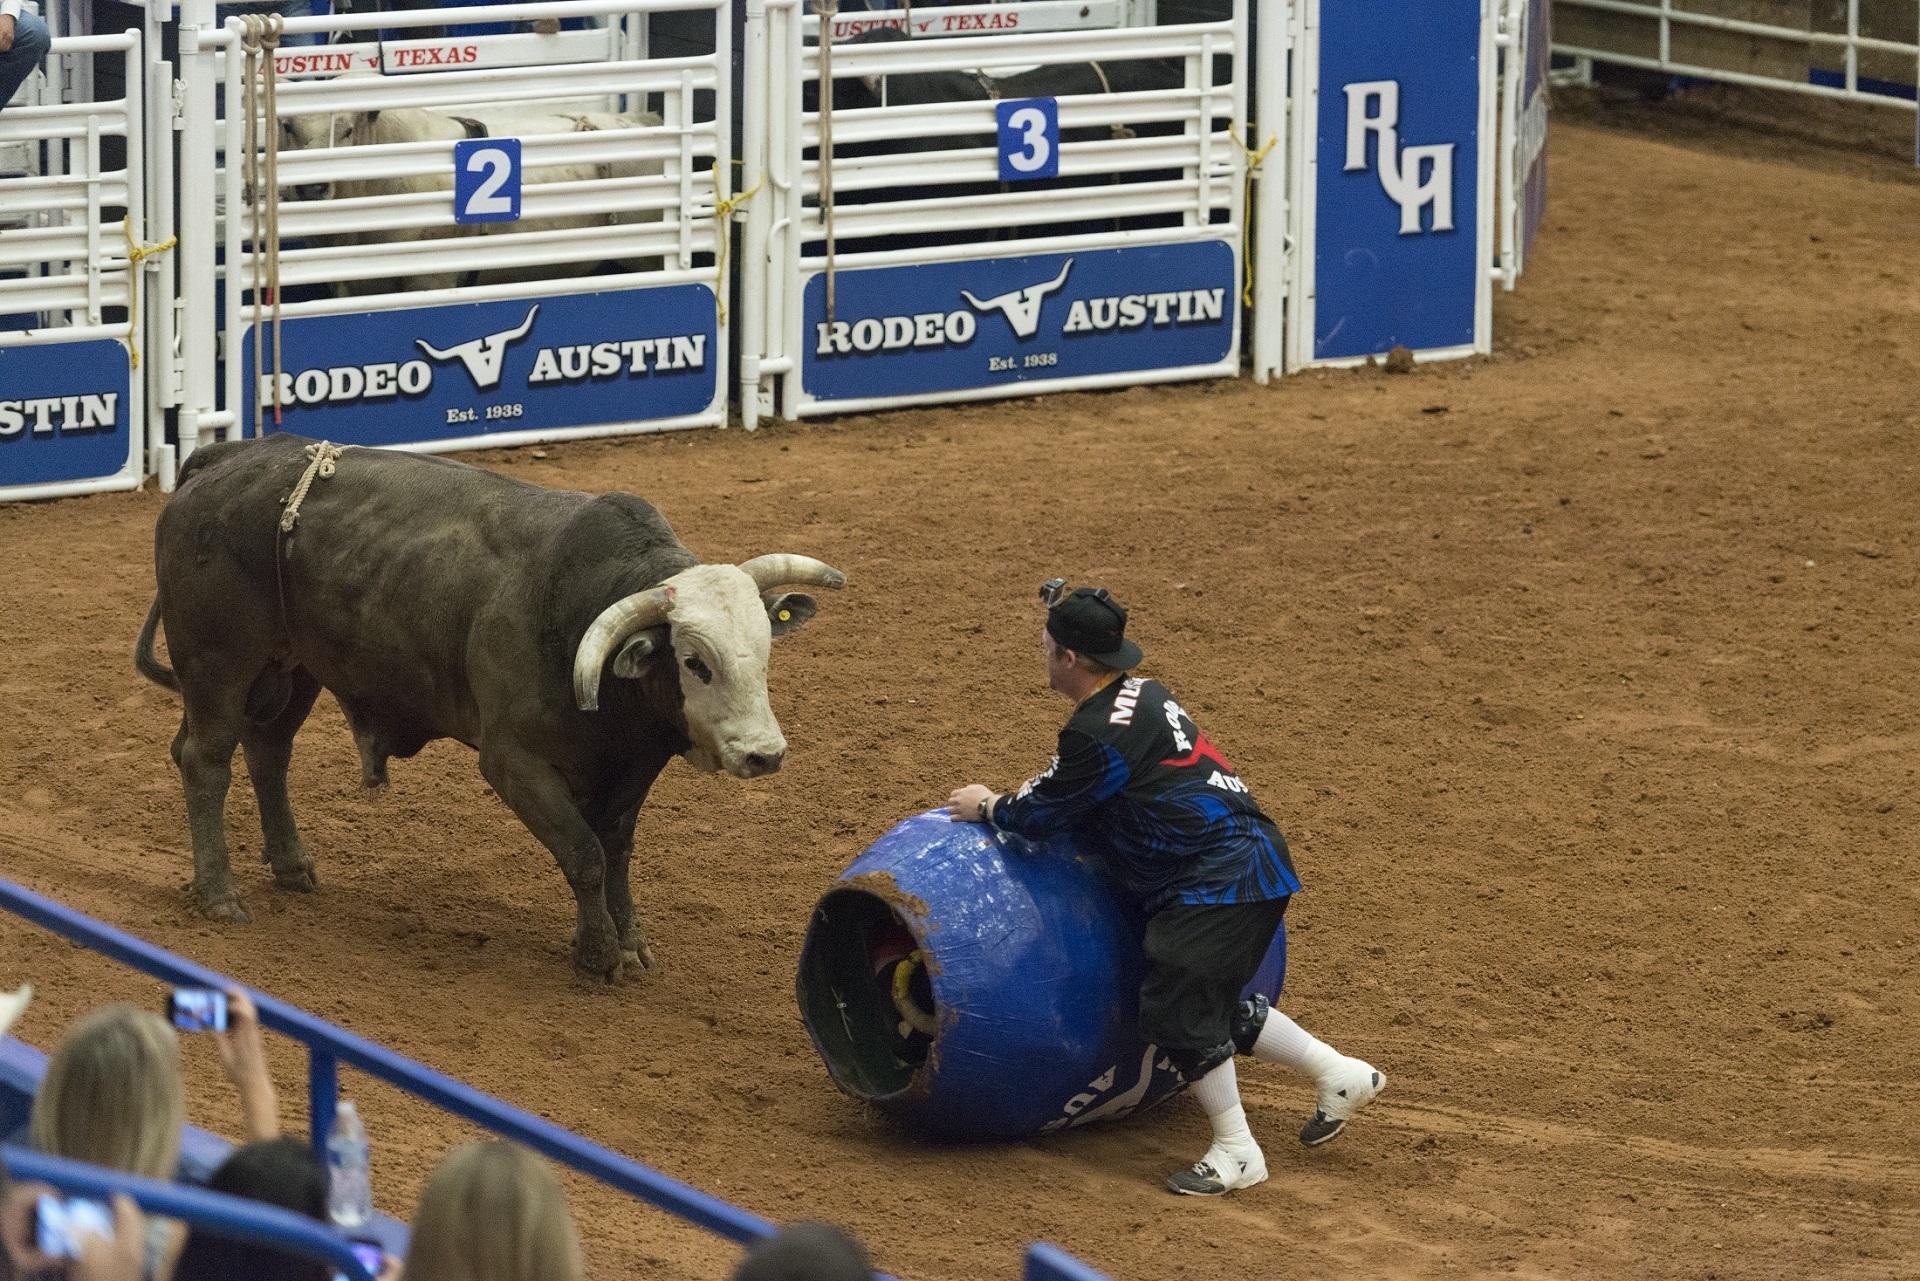 Rodeo austin photo